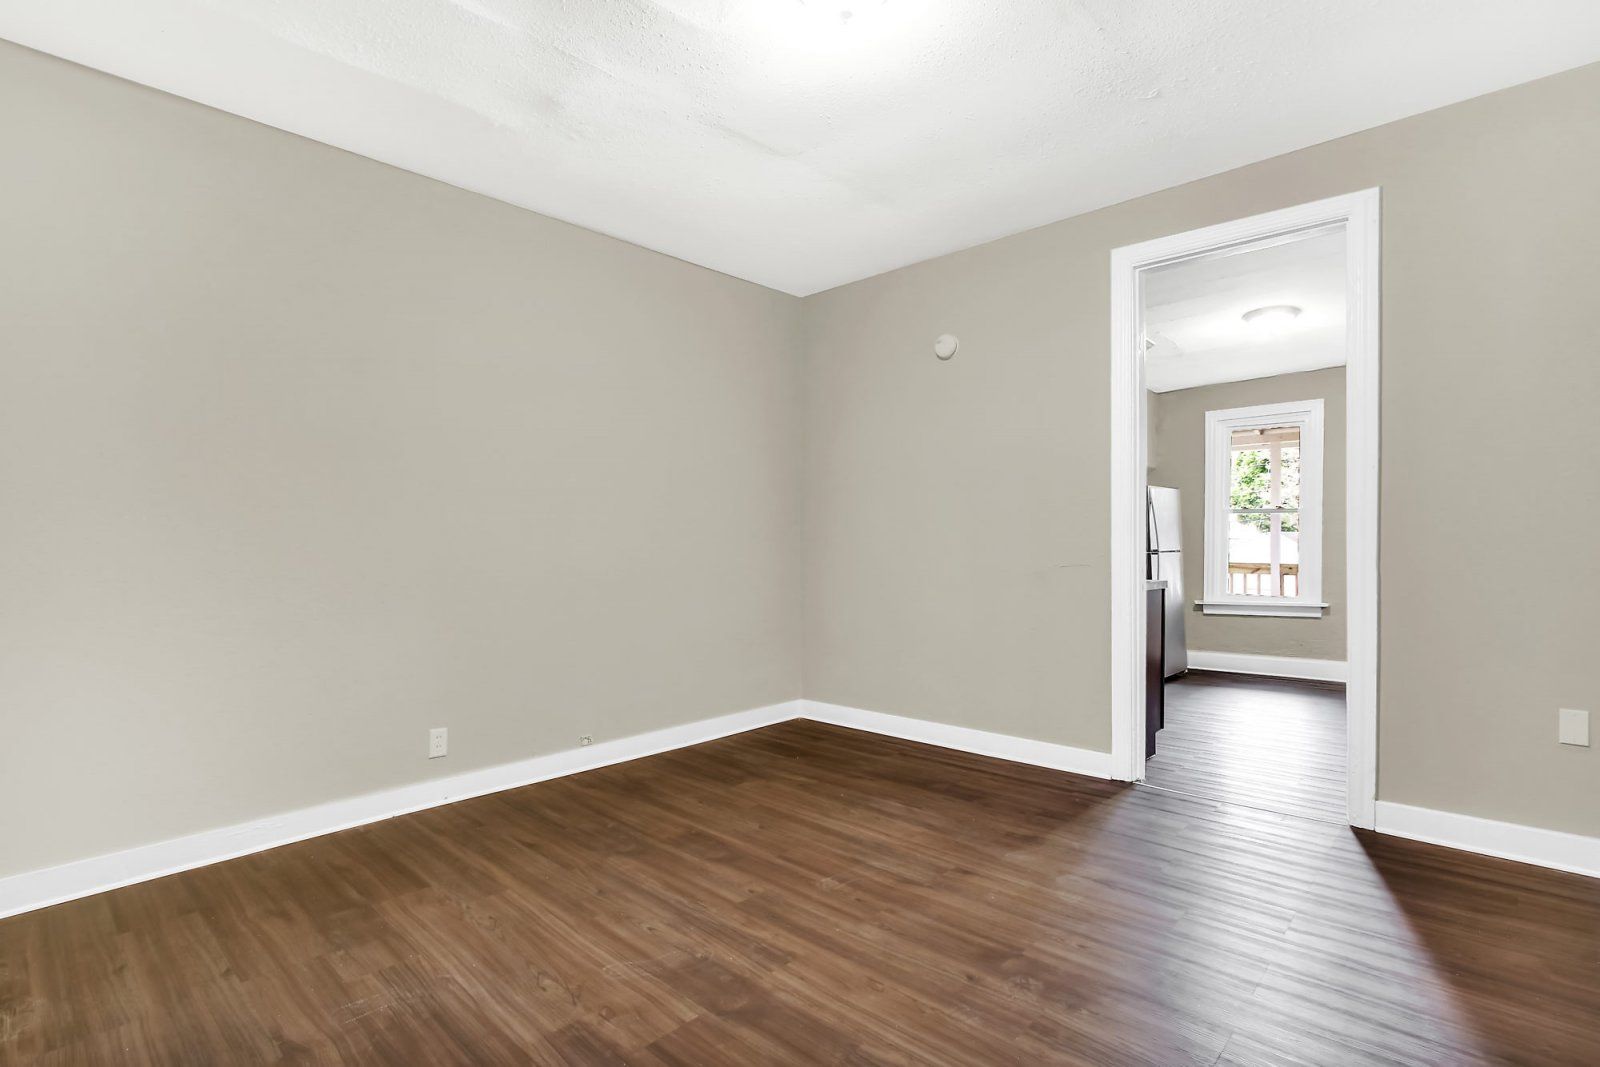 2730 Penbrook Ave Harrisburg Pa 17103 Cr Property Group